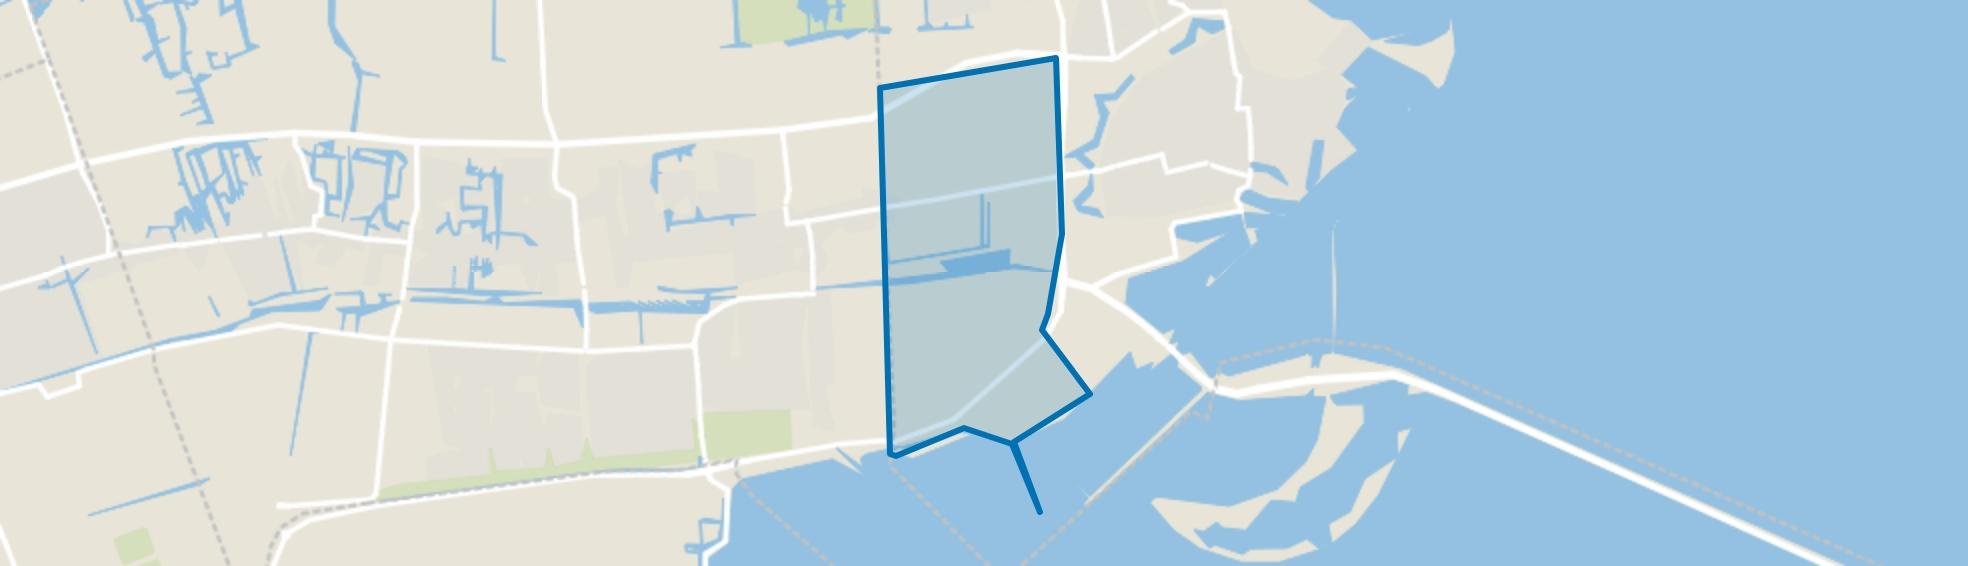 Westeinde, Enkhuizen map